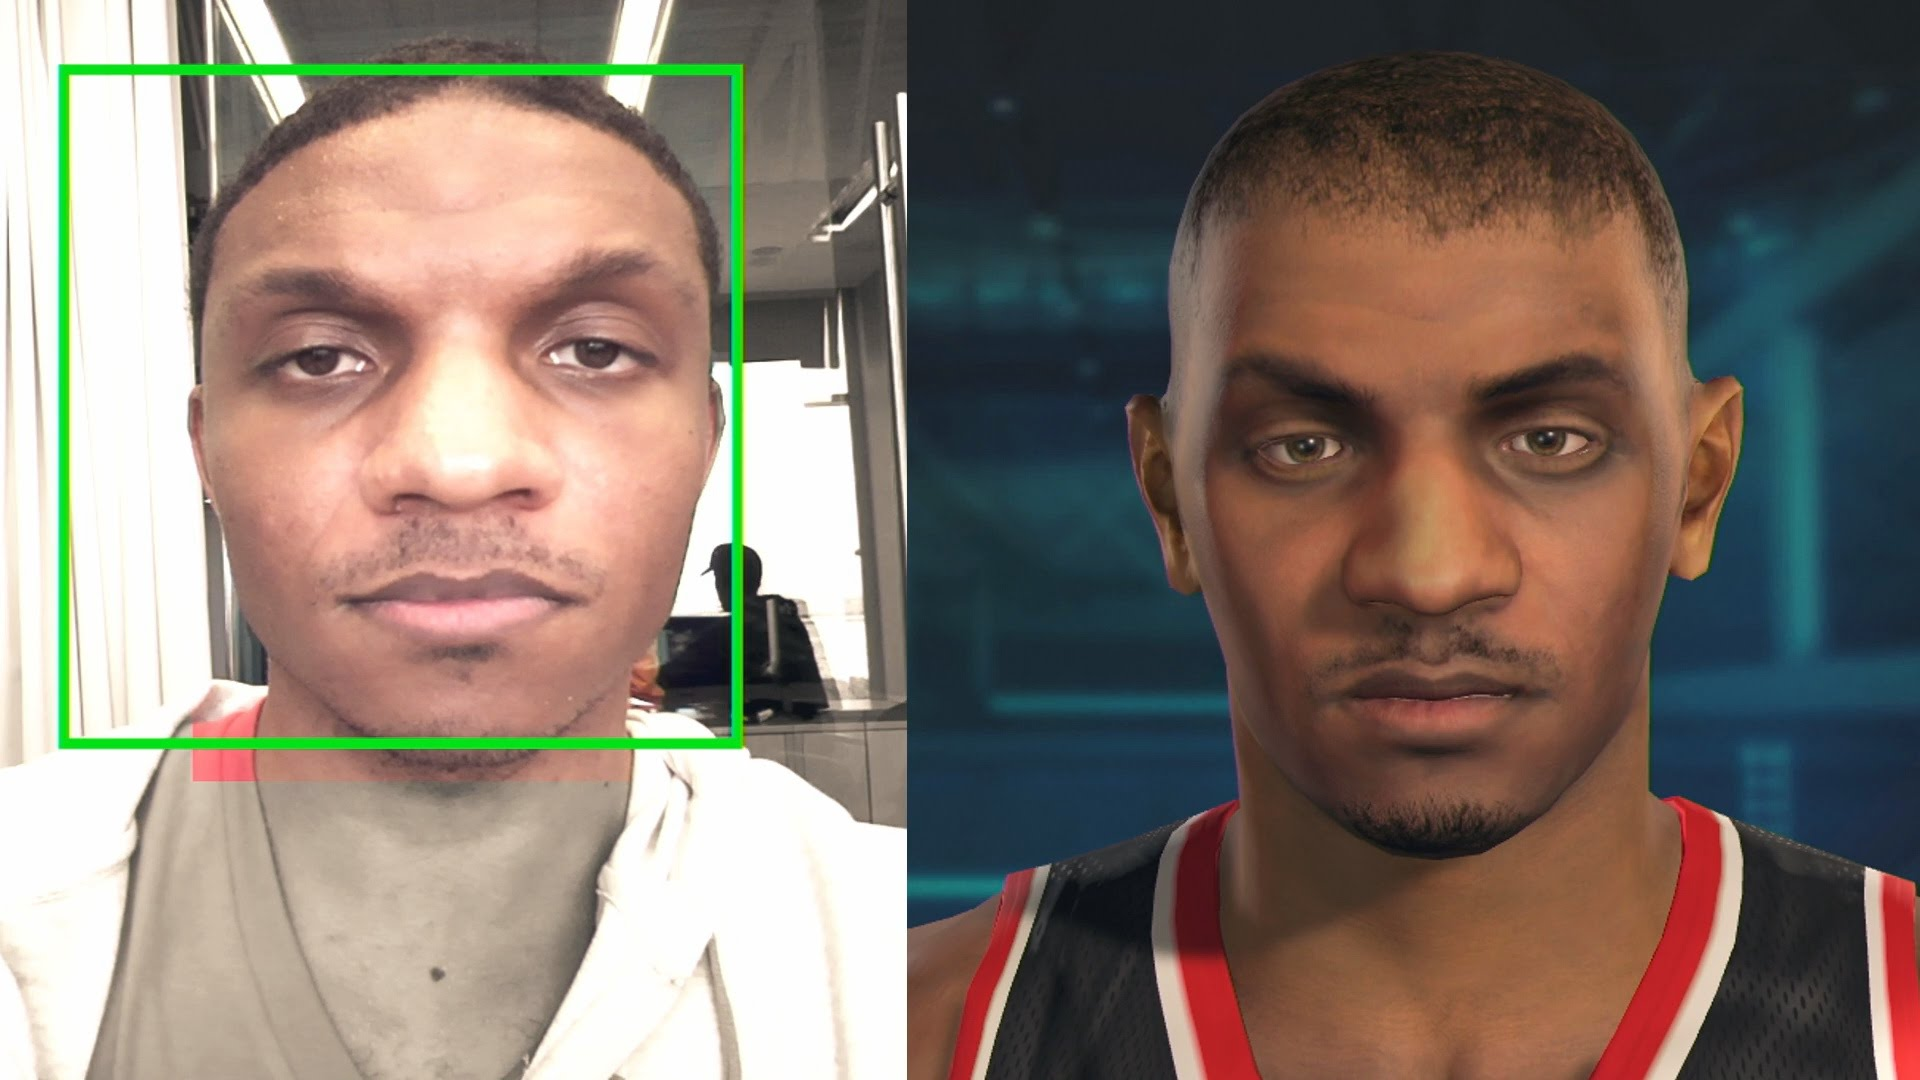 So funktioniert der Face Scan in NBA 2K15